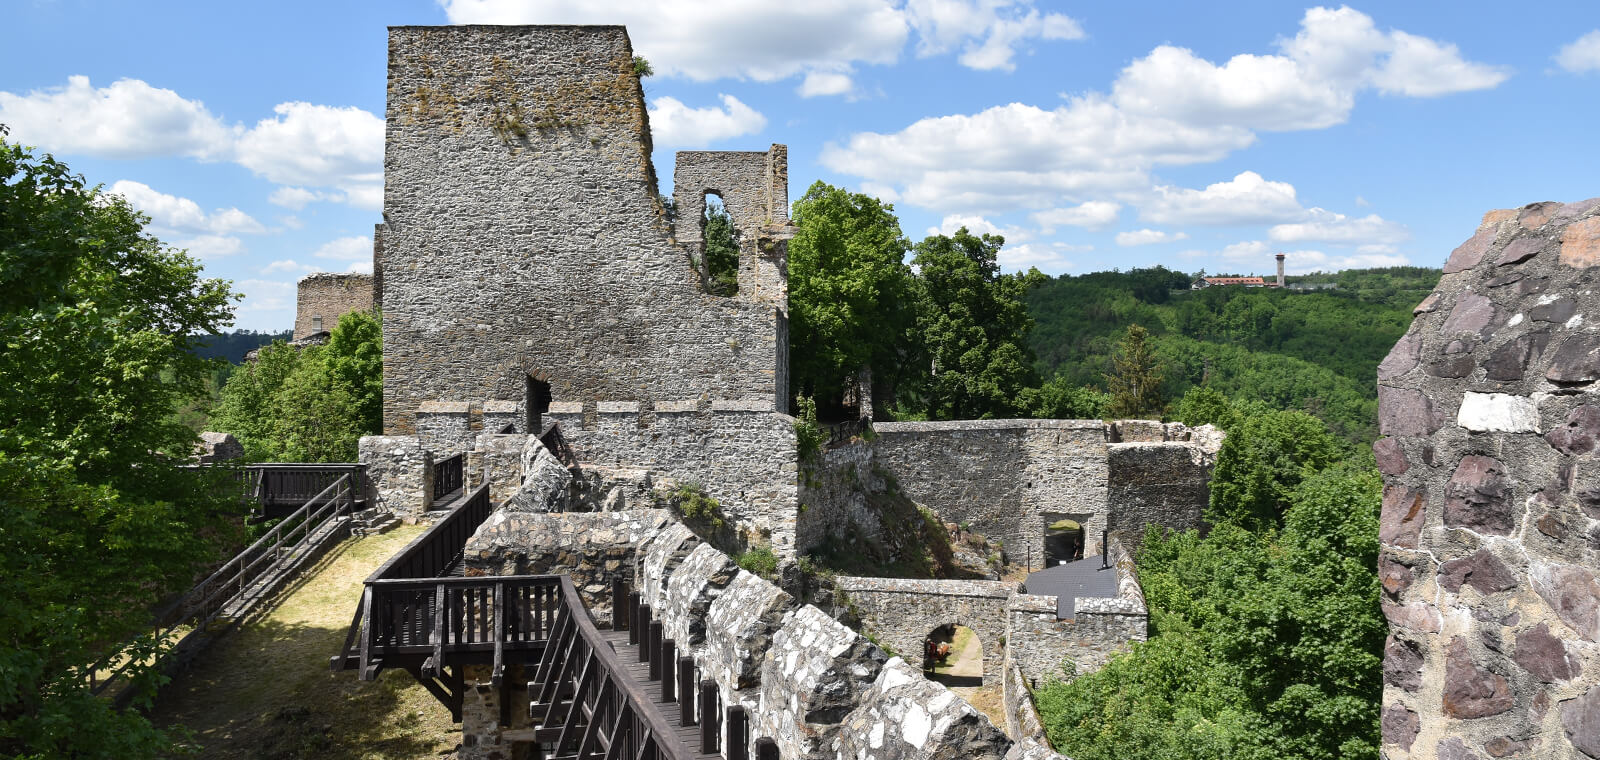 Zricenina-hradu-Cornstejn-teaser-01.jpg